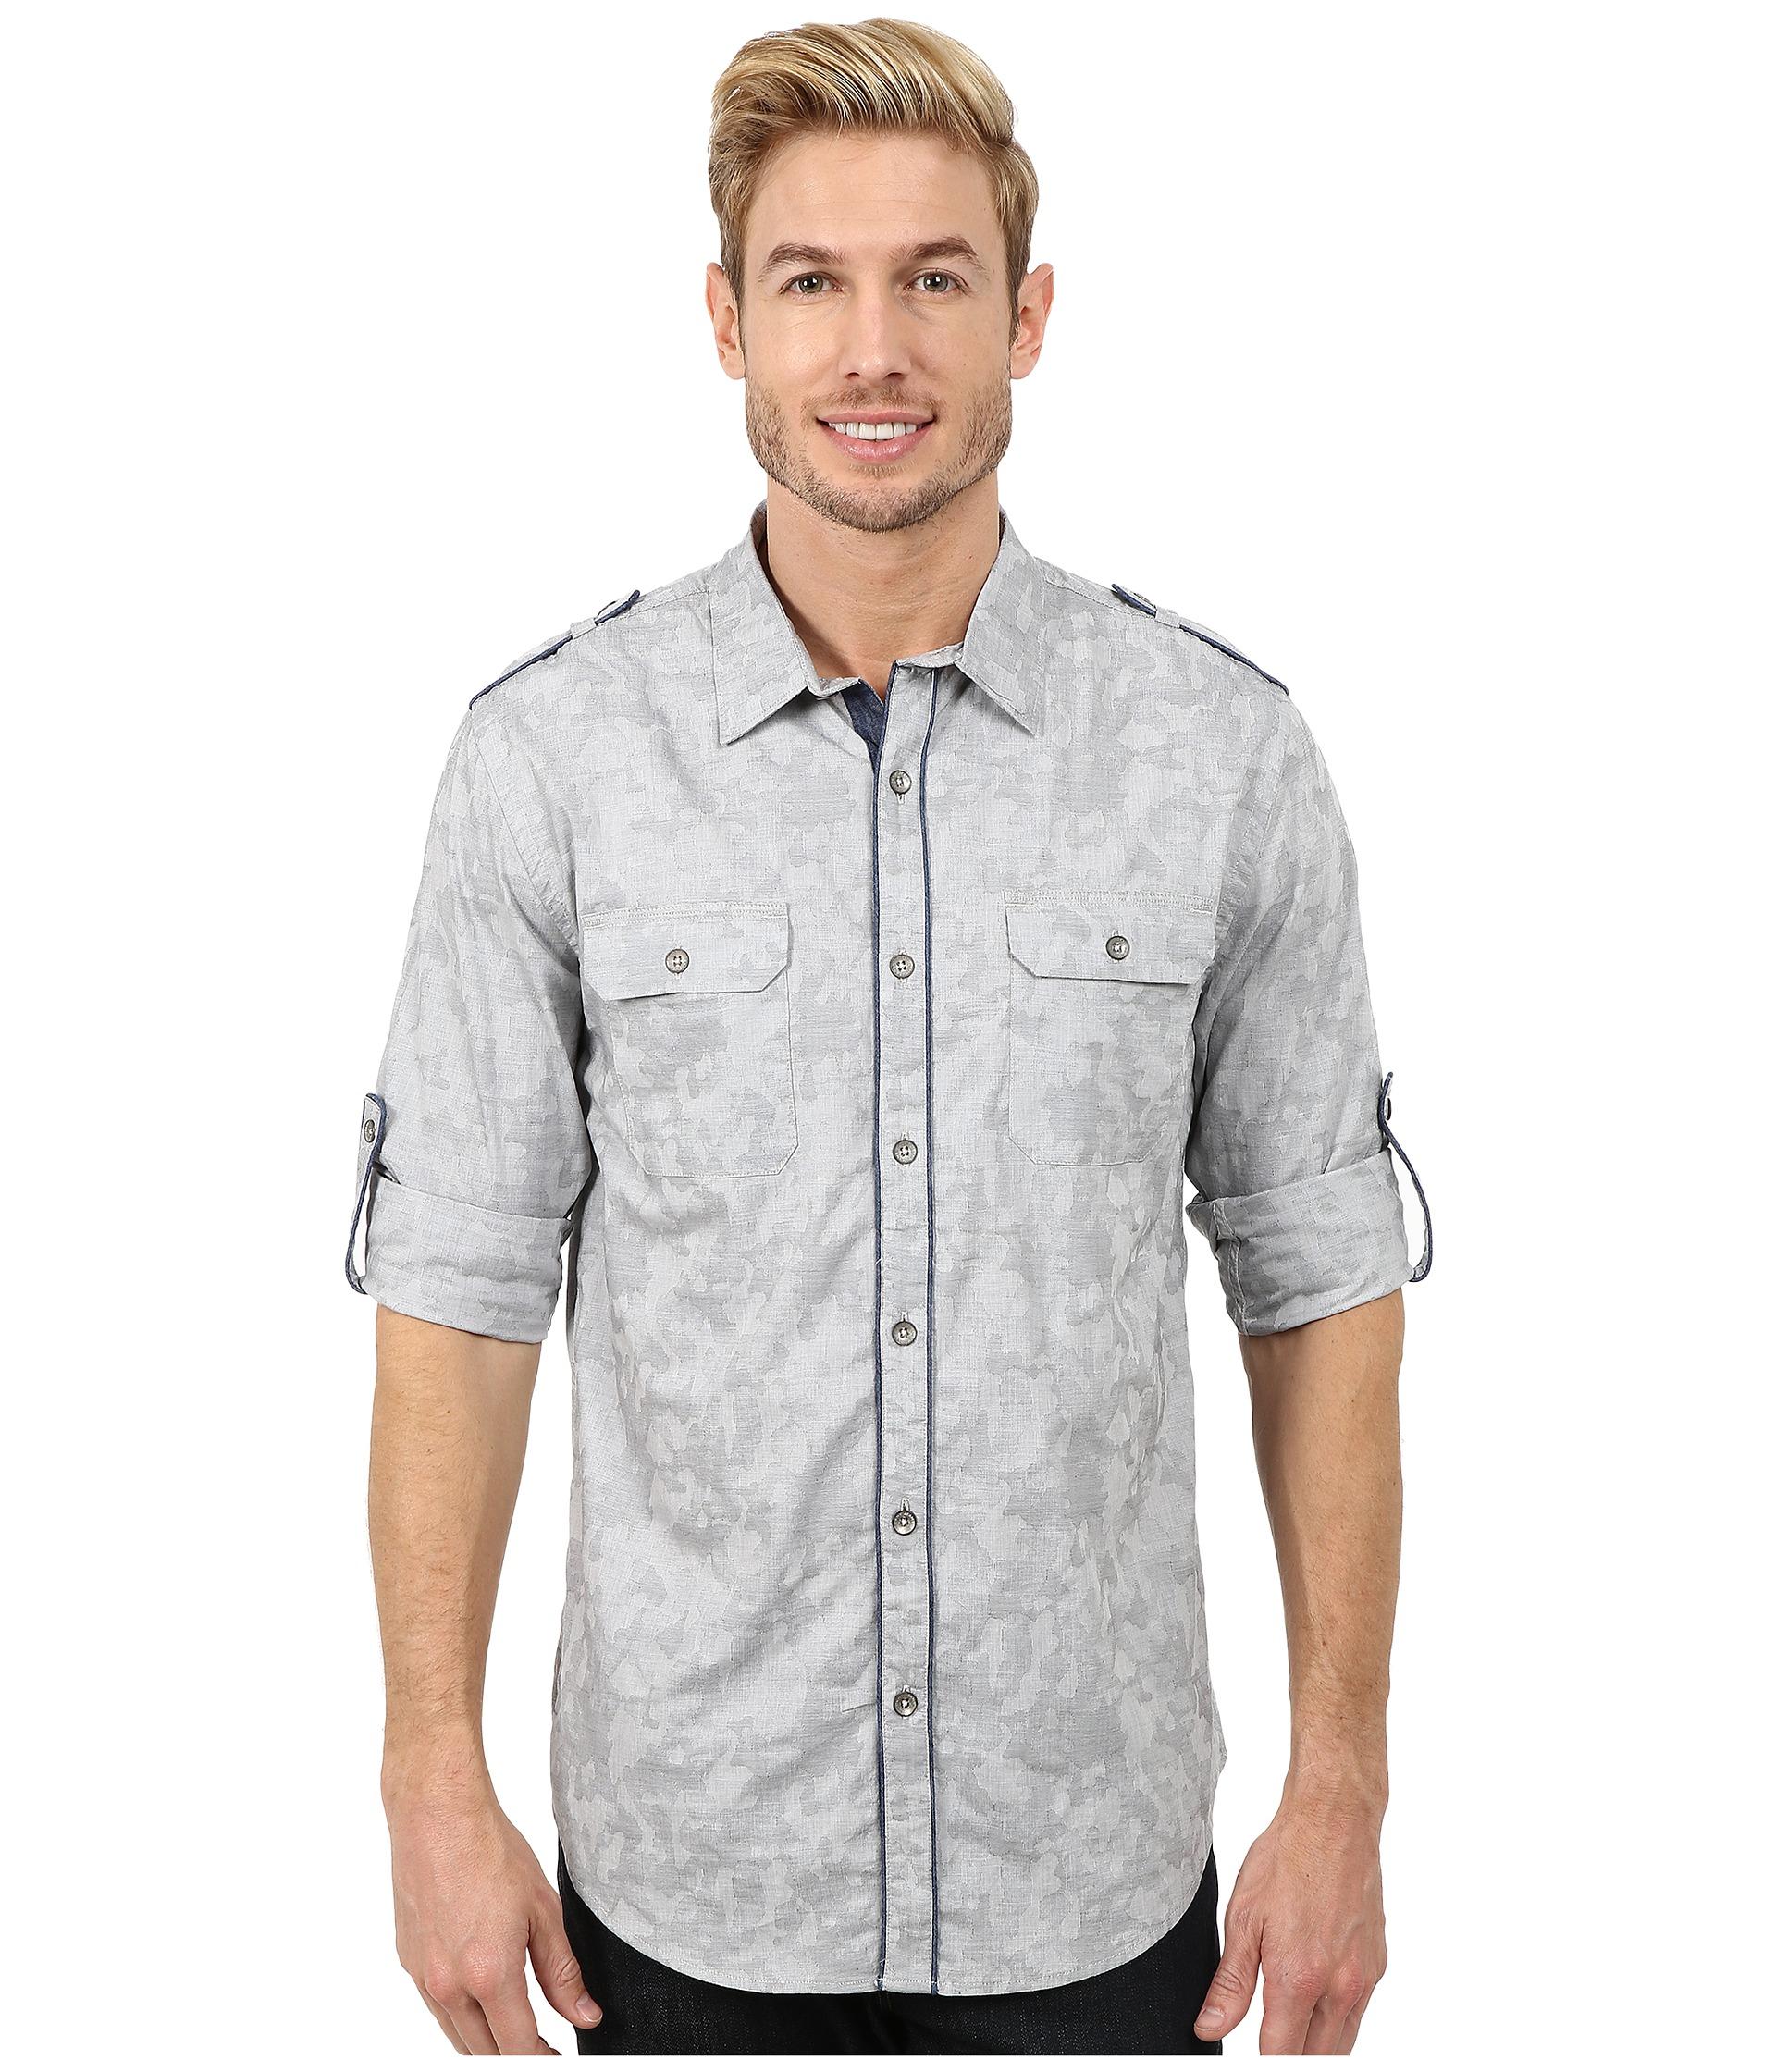 Dkny Jeans Long Sleeve Roll Tab Jacquard Camo Shirt Casual